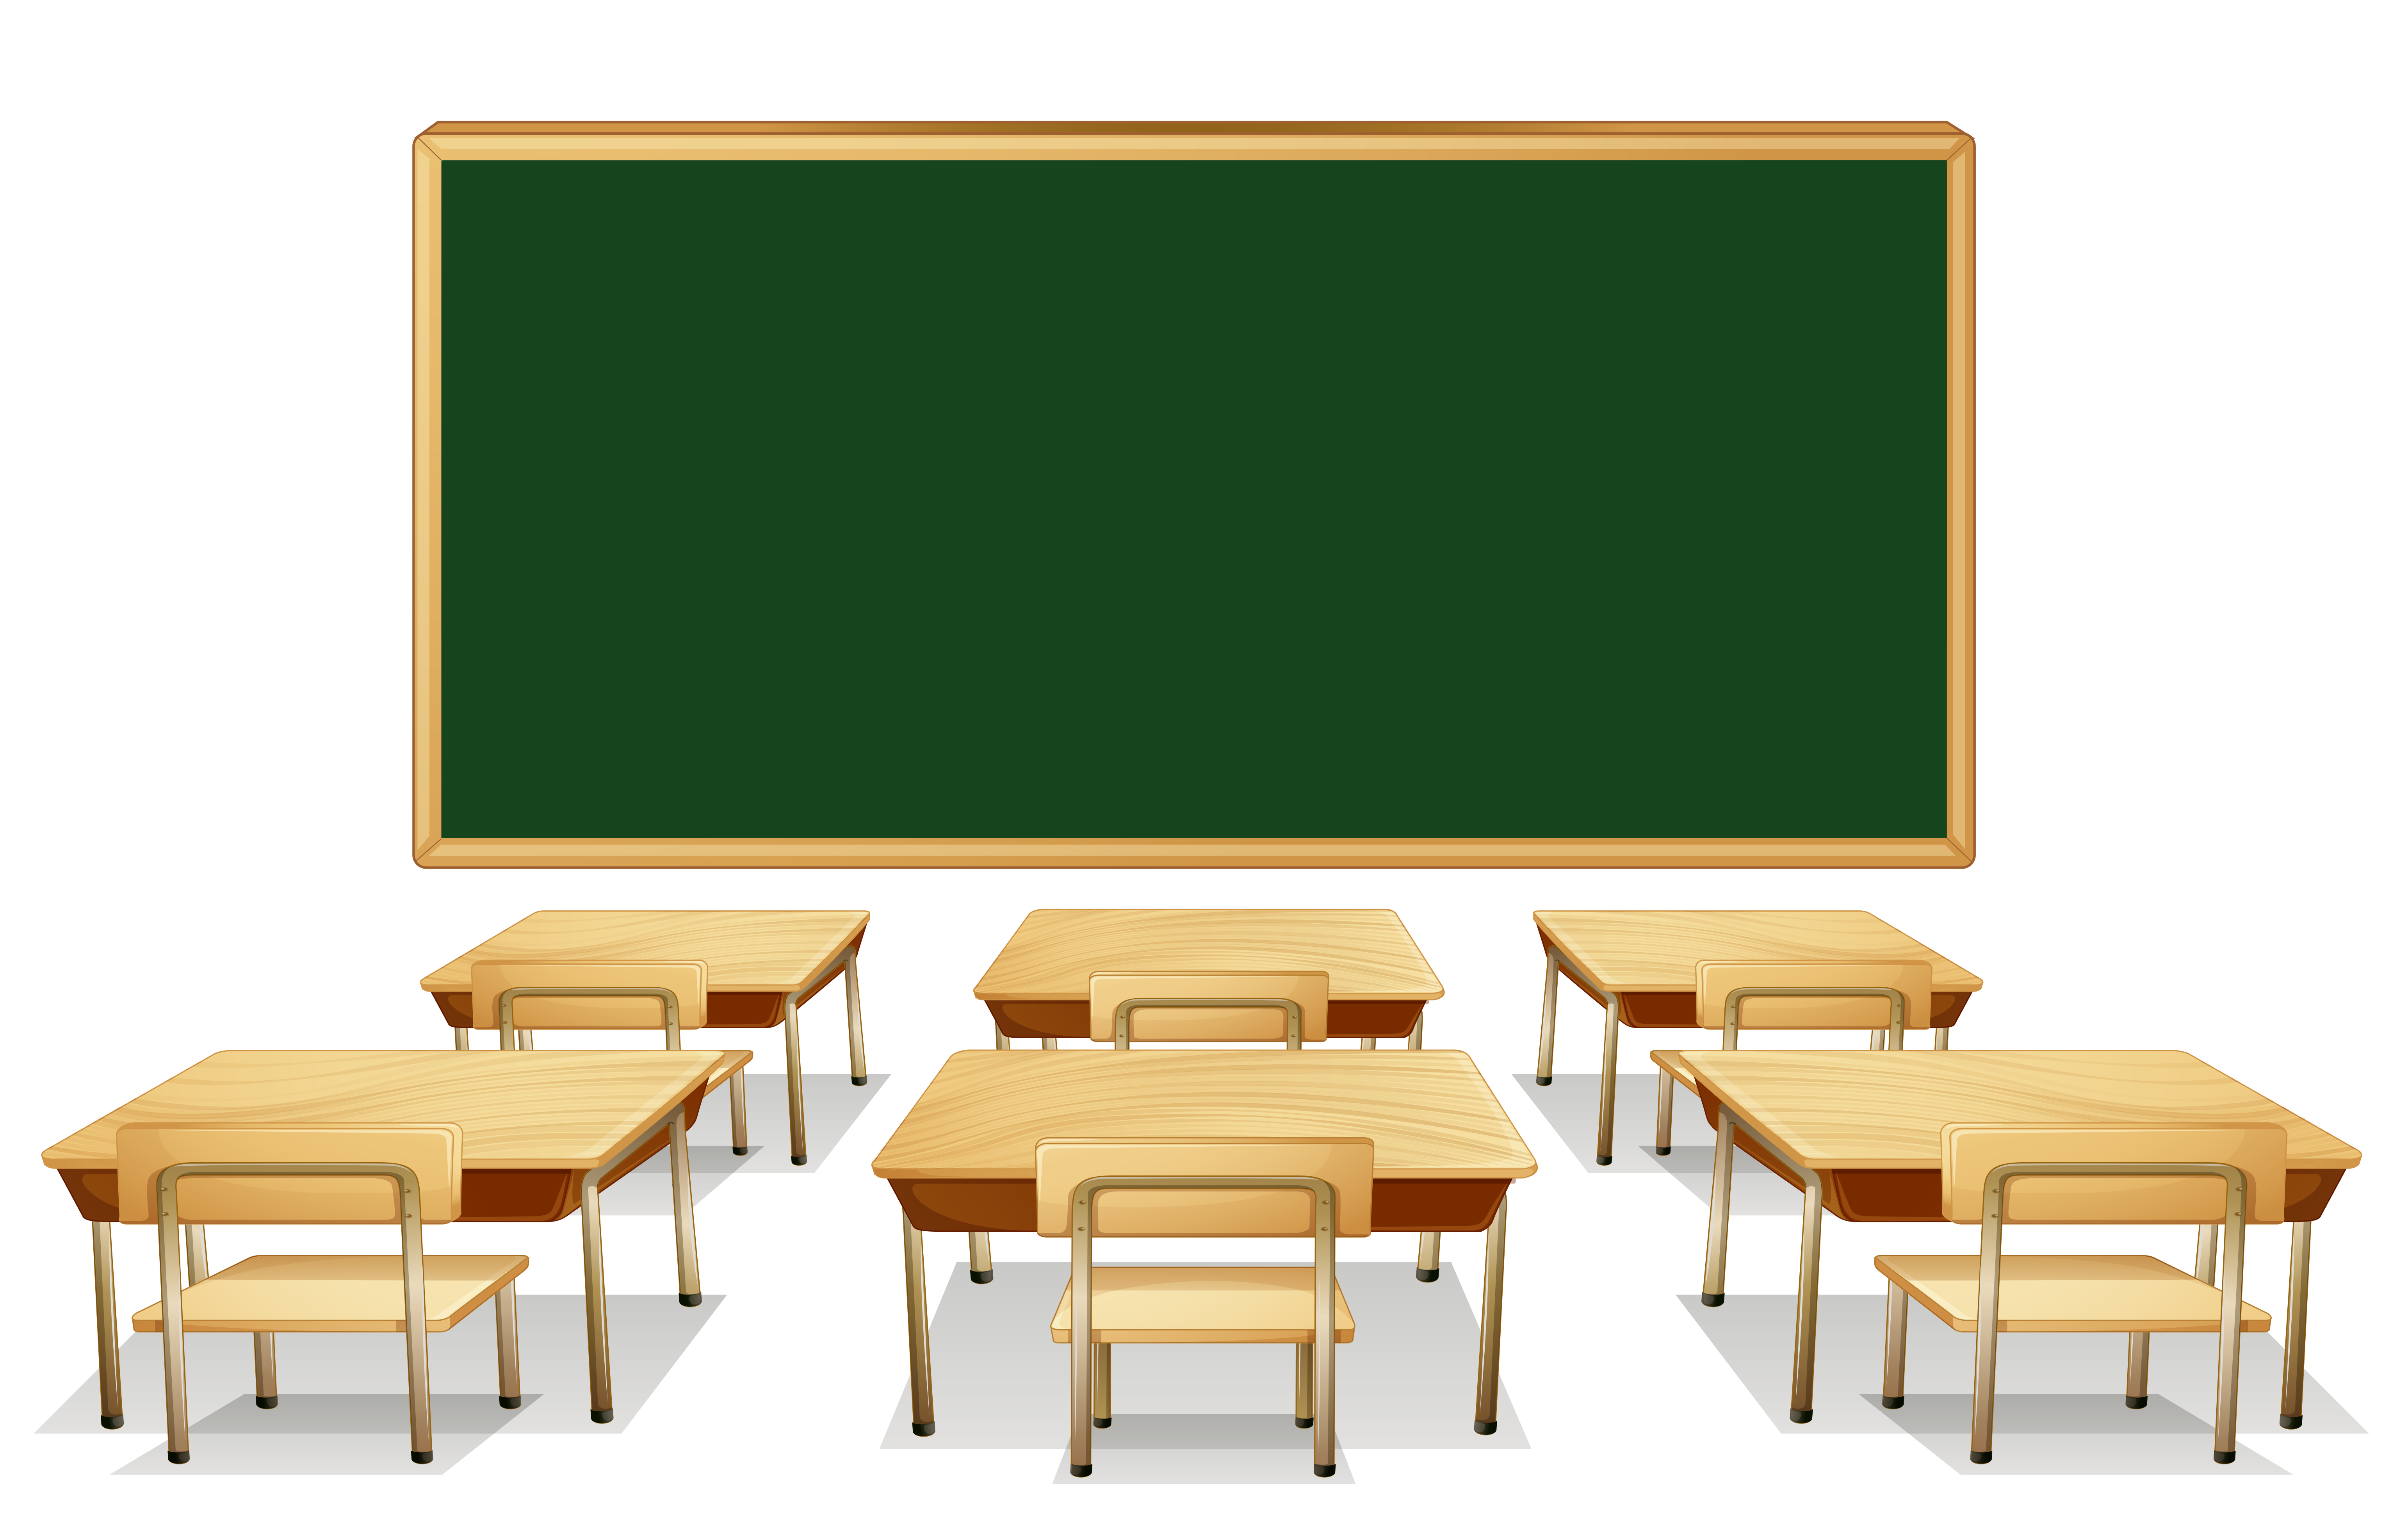 Comanche springs elementary clip. Clipart computer classroom